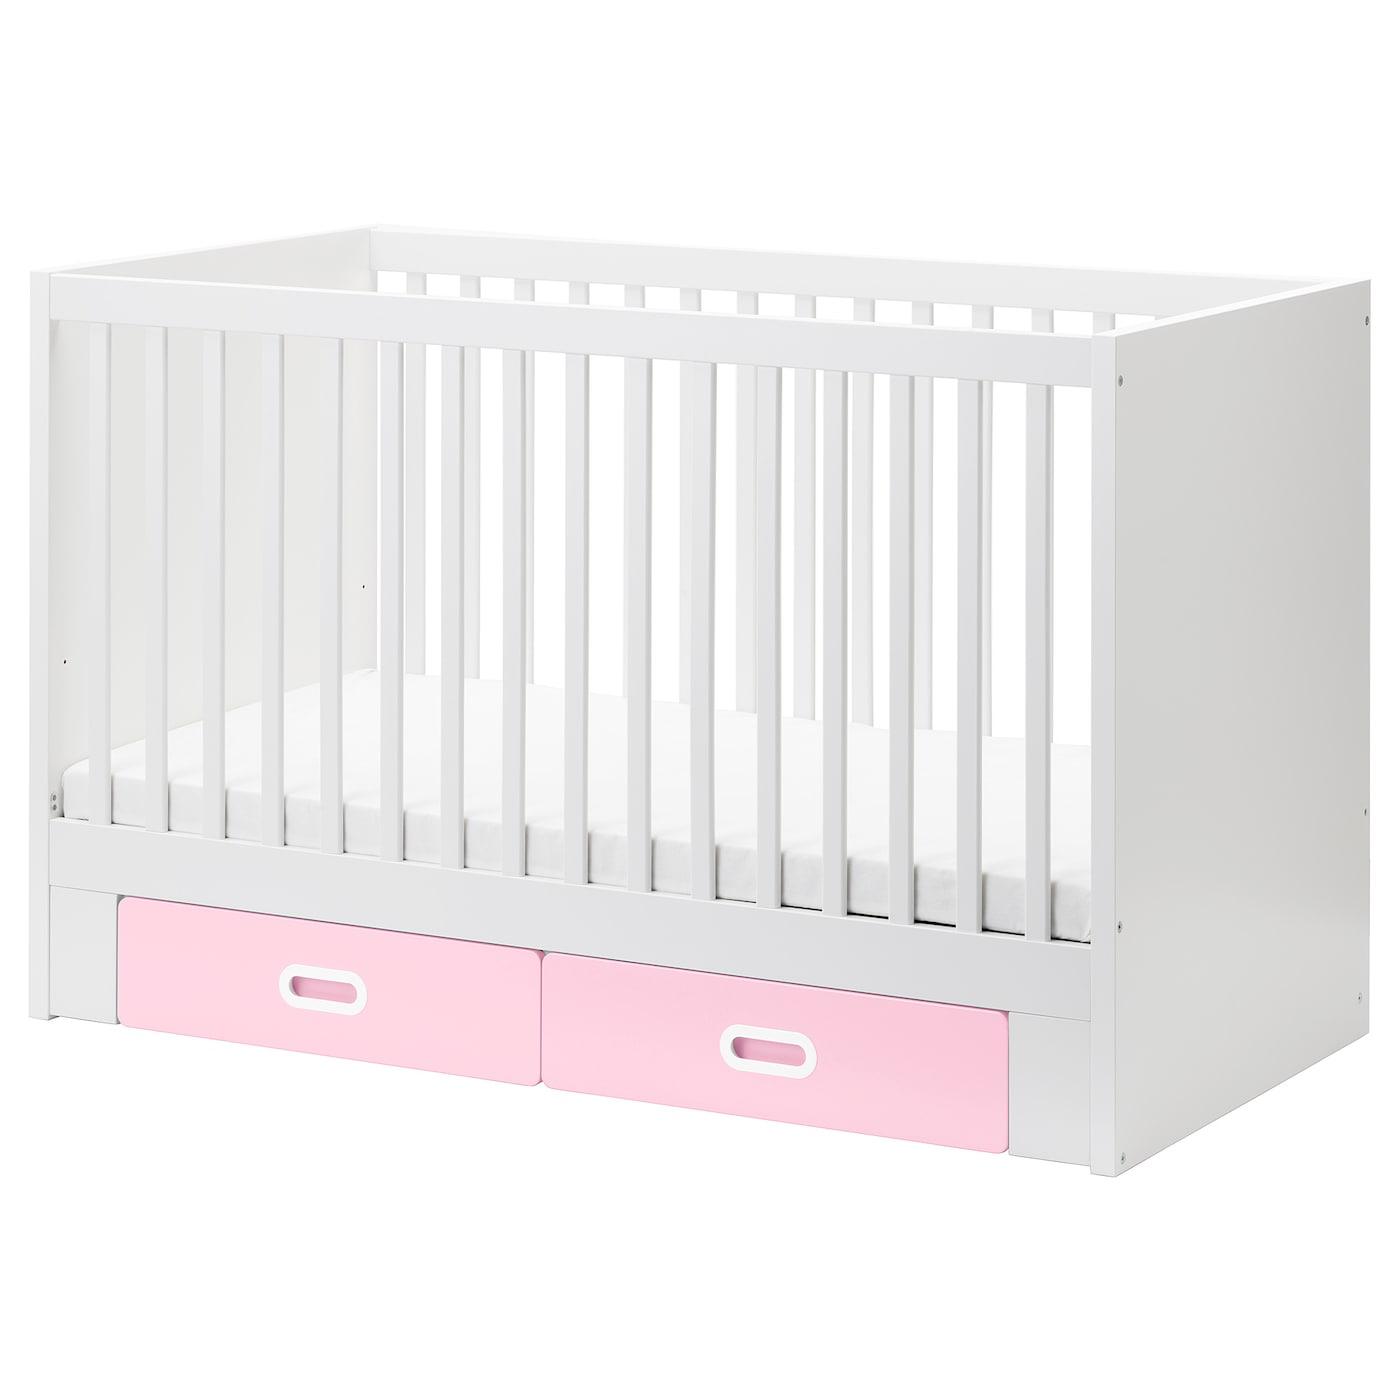 STUVA / FRITIDS   Kinderzimmer > Babymöbel > Babybetten & Babywiegen   Papier - Abs   IKEA